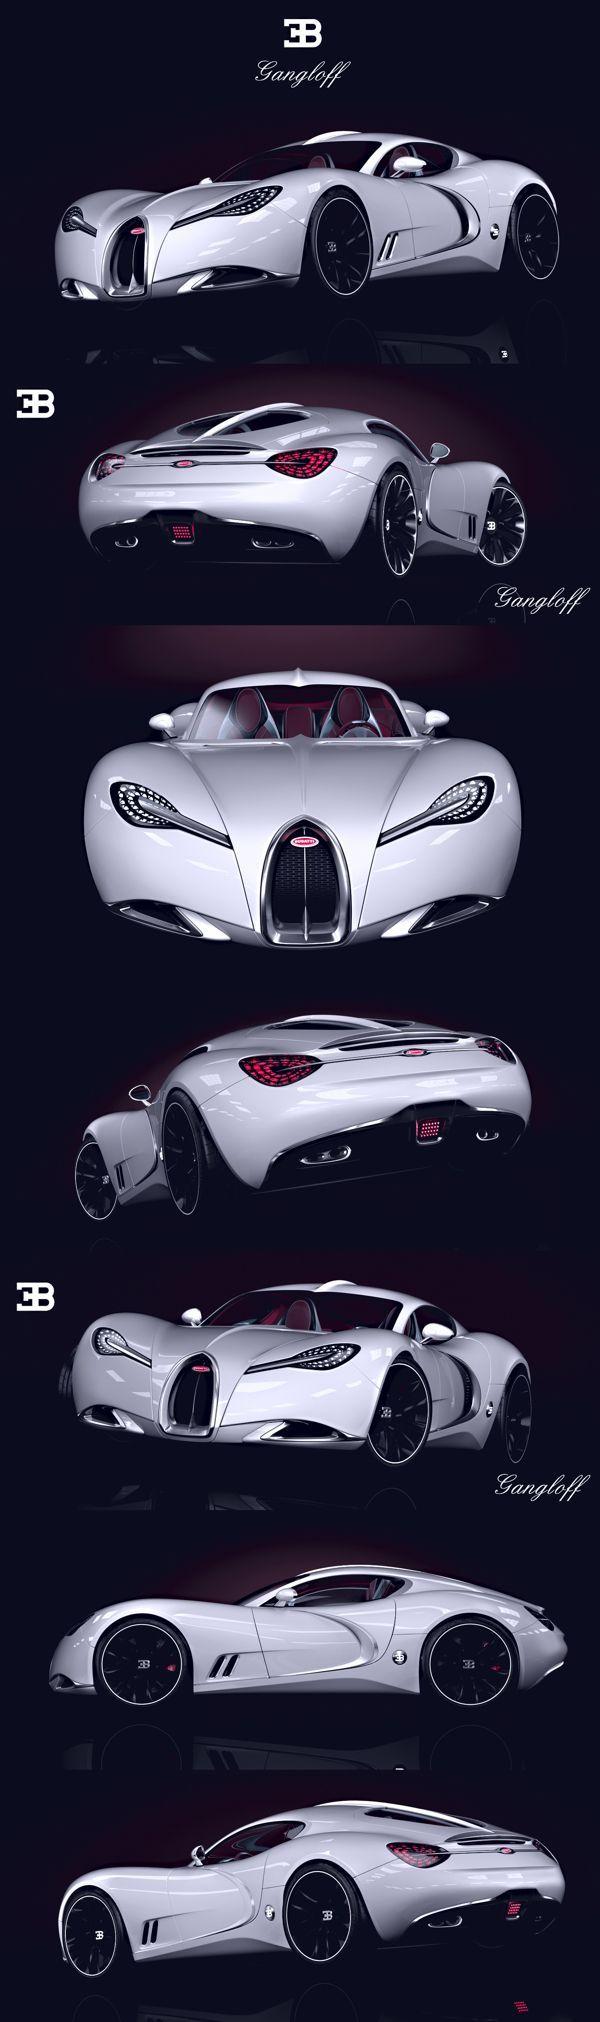 Projetos incríveis de carros conceito (2)